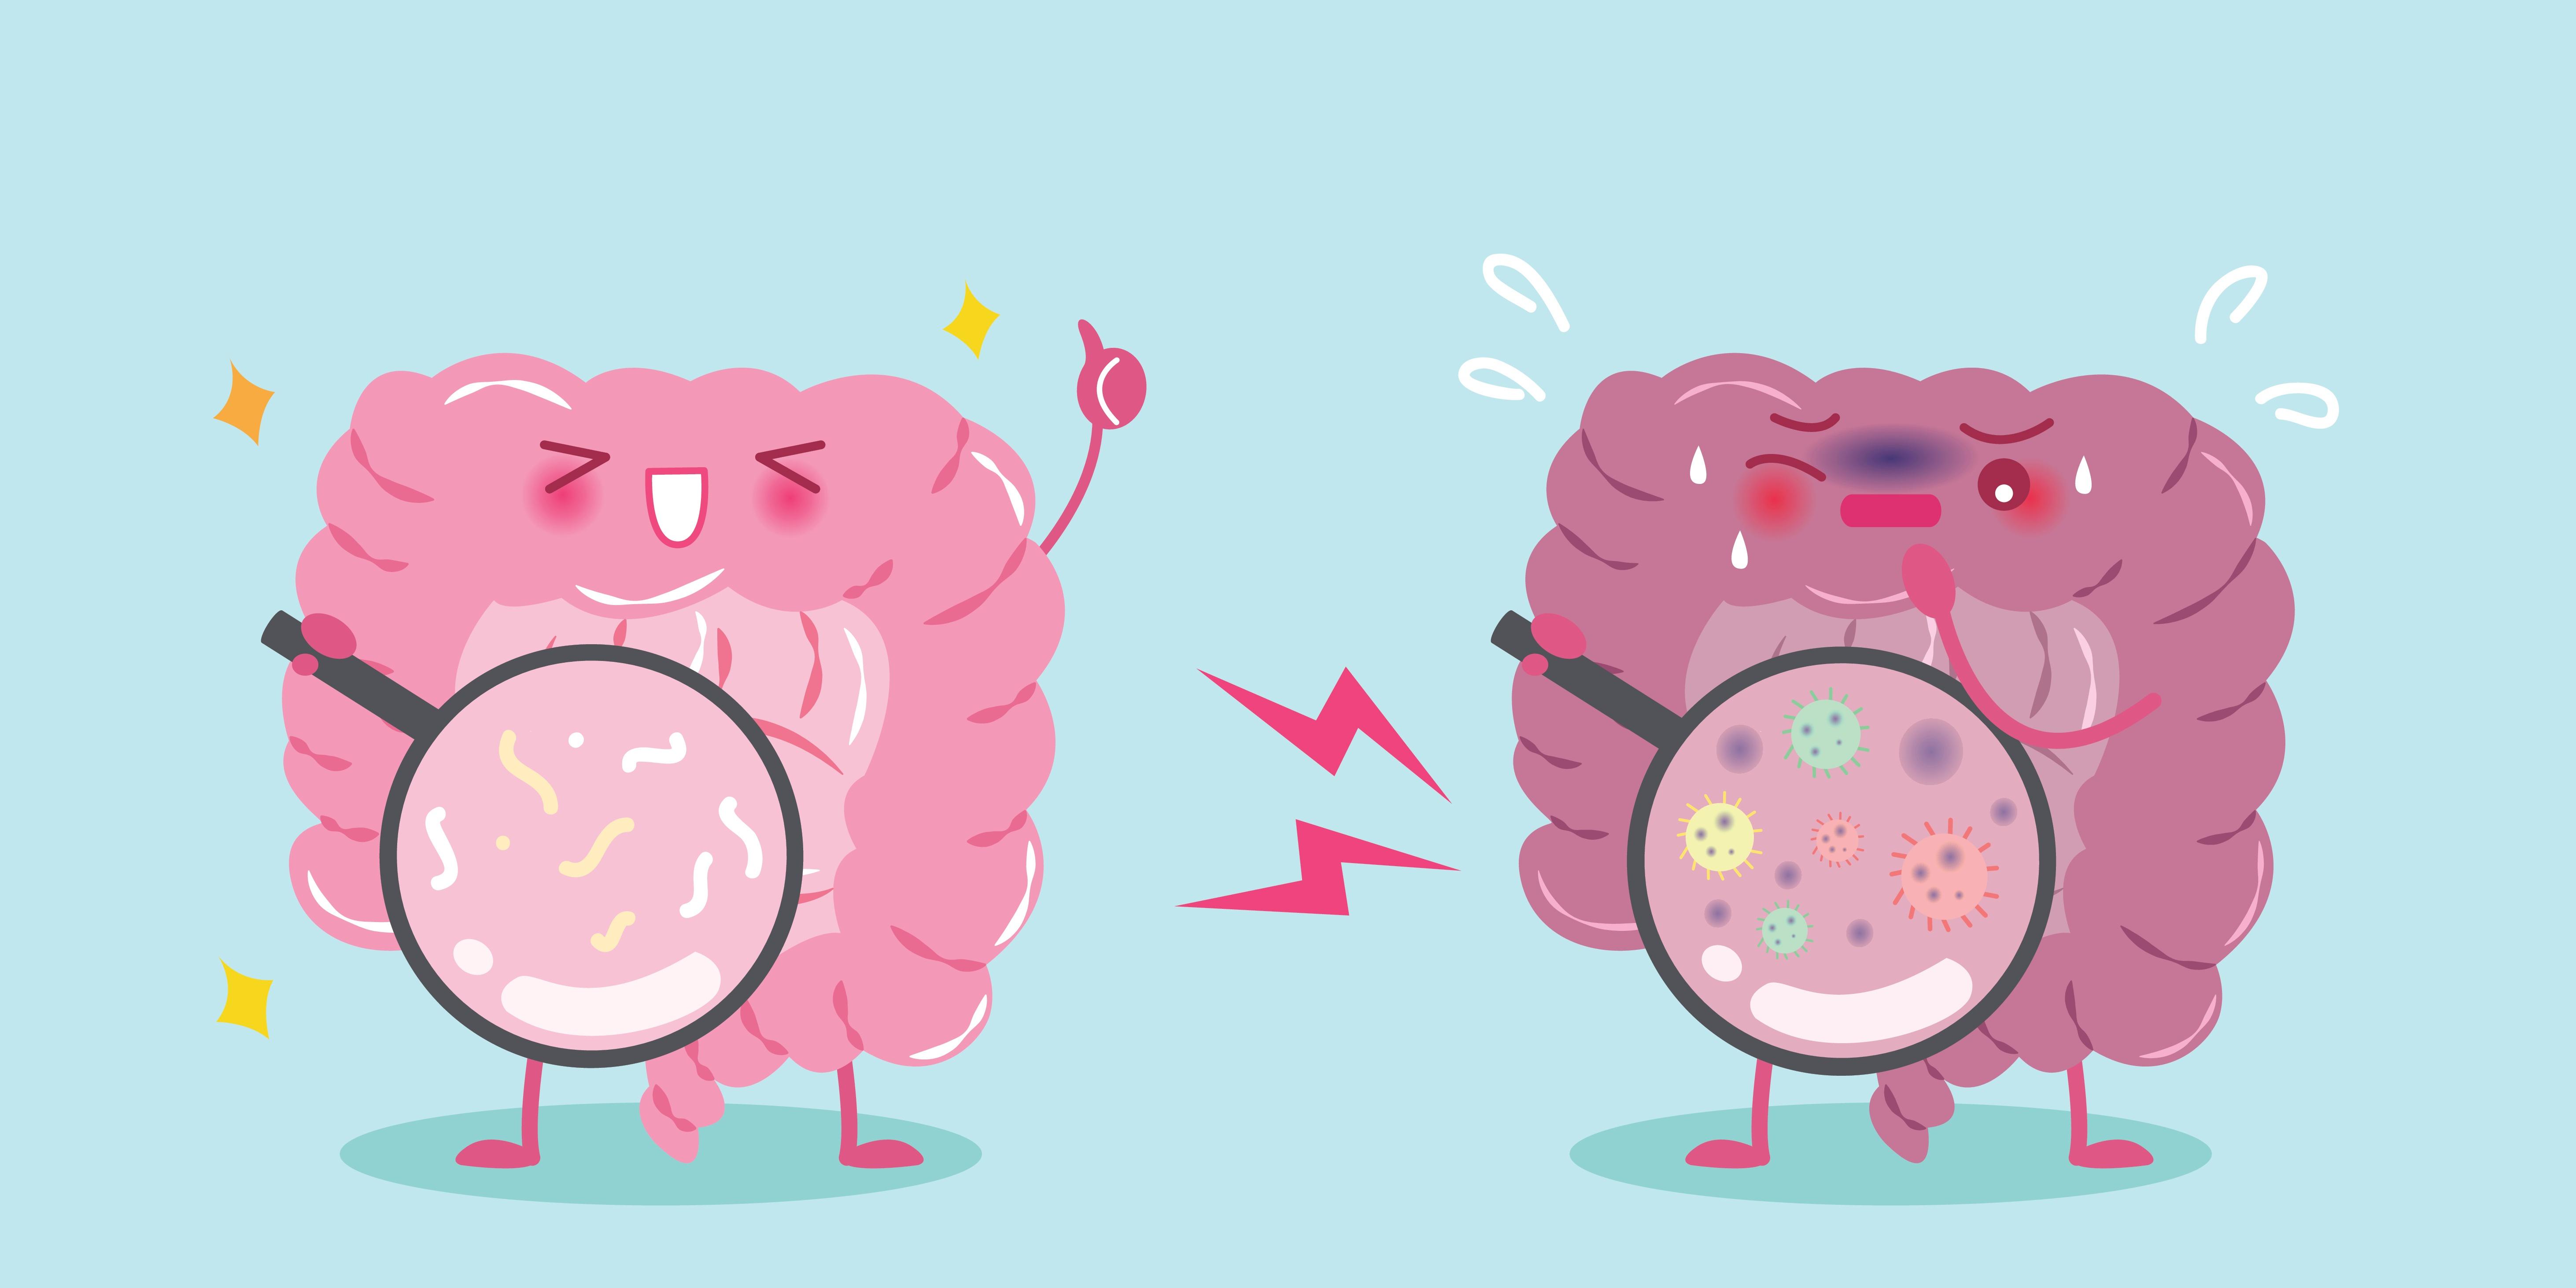 Research Insight - Benefits of Bacillus Probiotics and Rheumatoid Arthritis